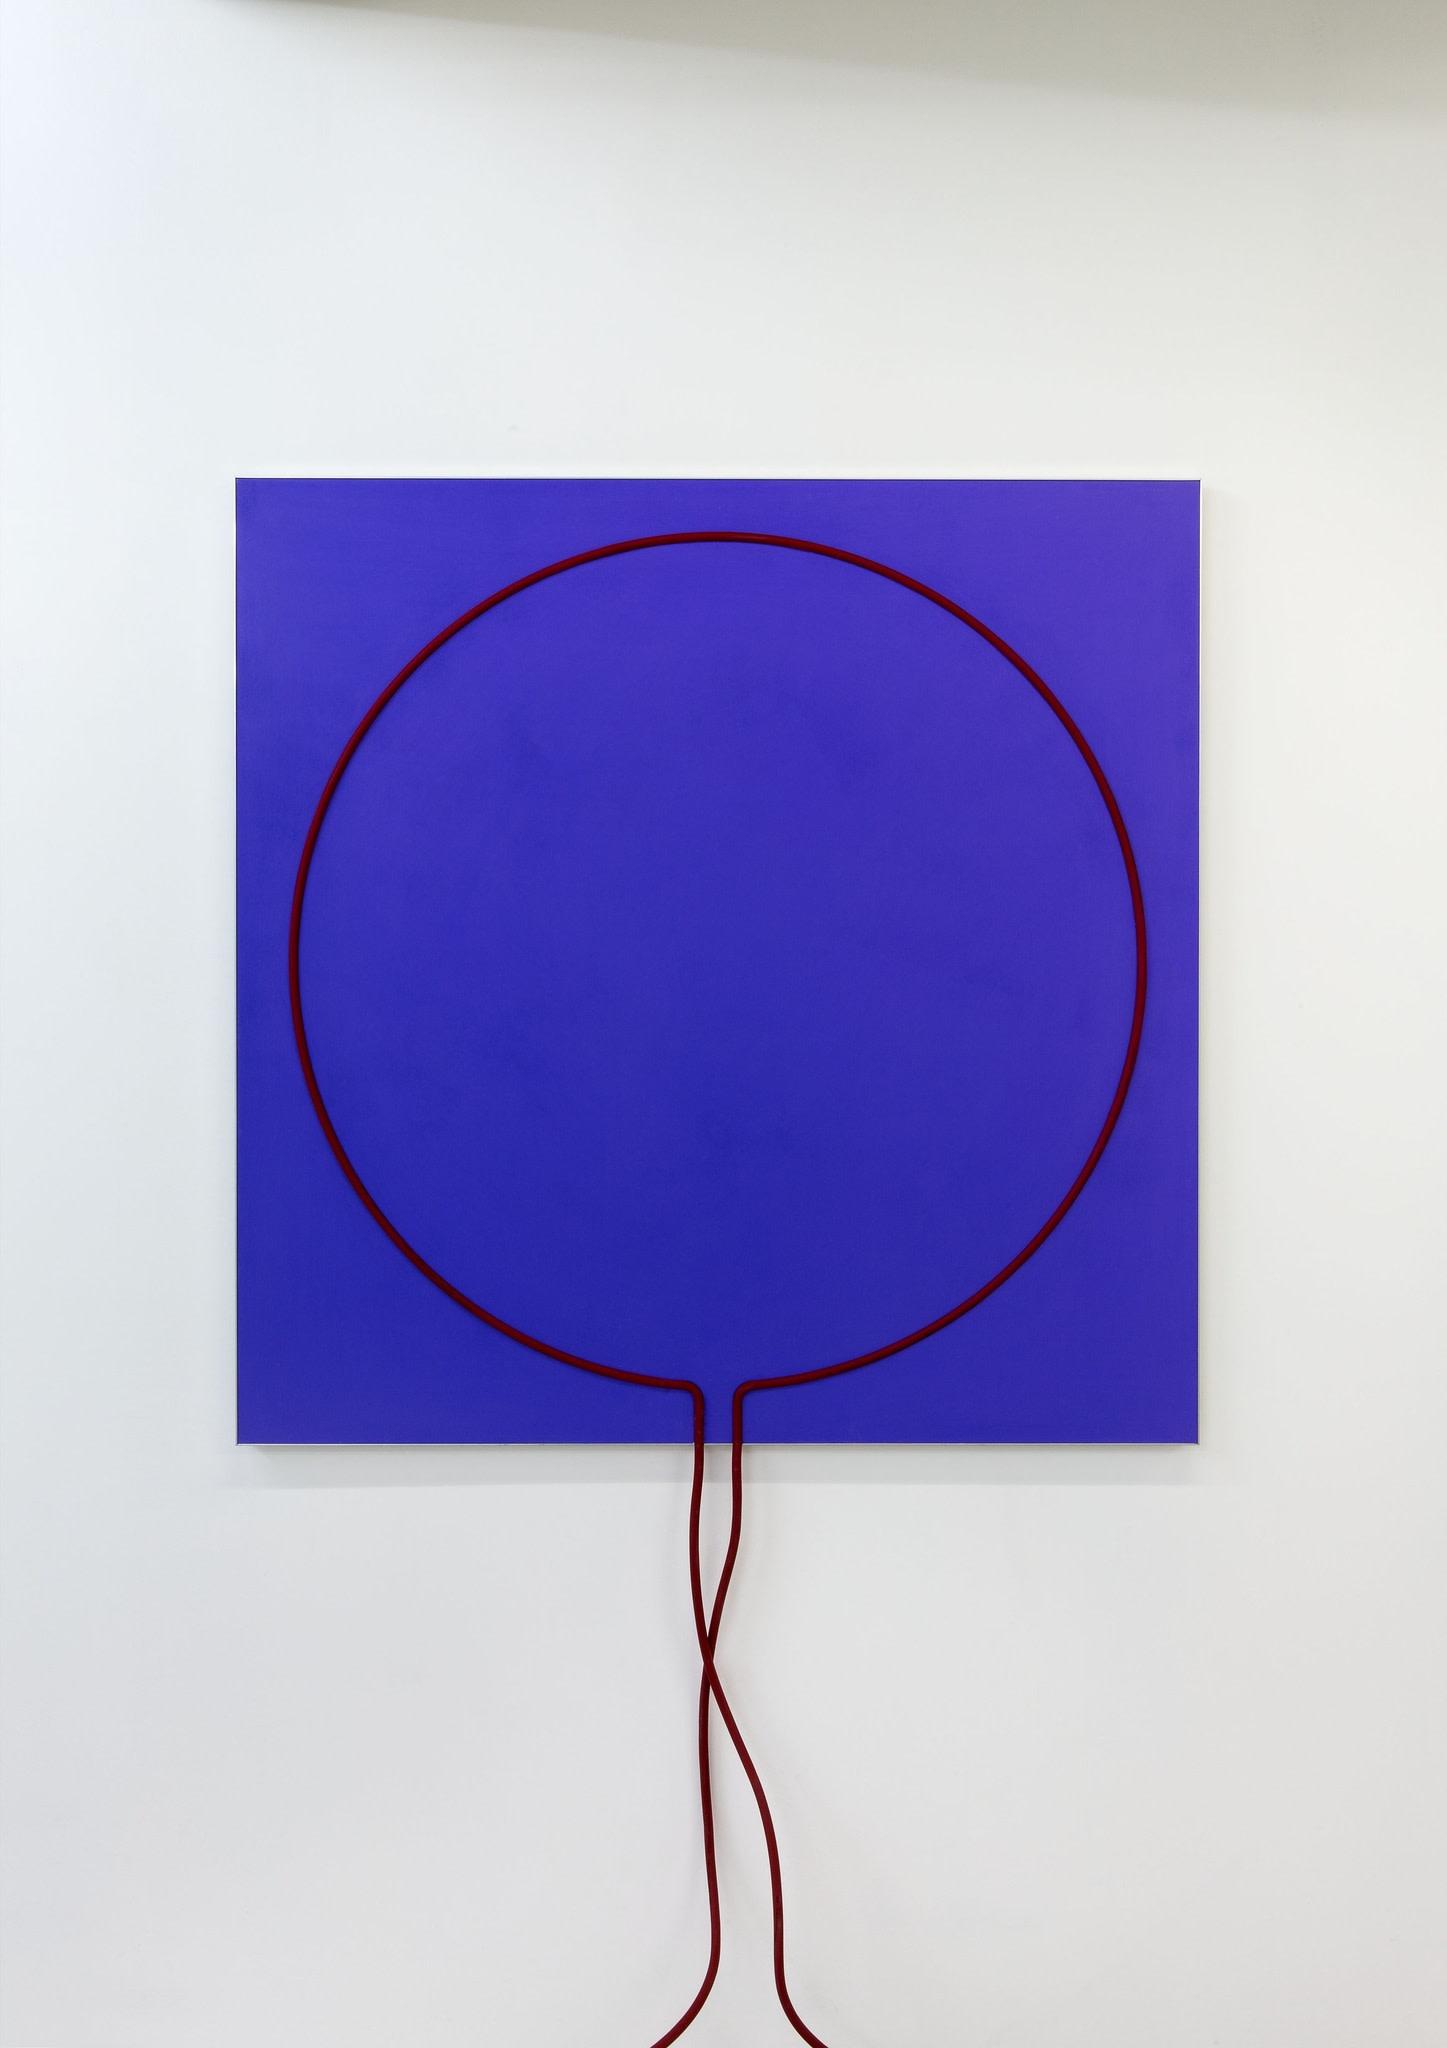 <span class=&#34;link fancybox-details-link&#34;><a href=&#34;/artists/44-jacob-dahlgren/works/8758/&#34;>View Detail Page</a></span><div class=&#34;artist&#34;><strong>Jacob Dahlgren</strong></div> <div class=&#34;title&#34;><em>Third Uncle #4</em>, 2015</div> <div class=&#34;medium&#34;>MDF, acrylic paint, electrical cable, aluminium</div> <div class=&#34;dimensions&#34;>100 x 100 cm<br />39 3/8 x 39 3/8 in</div><div class=&#34;copyright_line&#34;>Copyright The Artist</div>